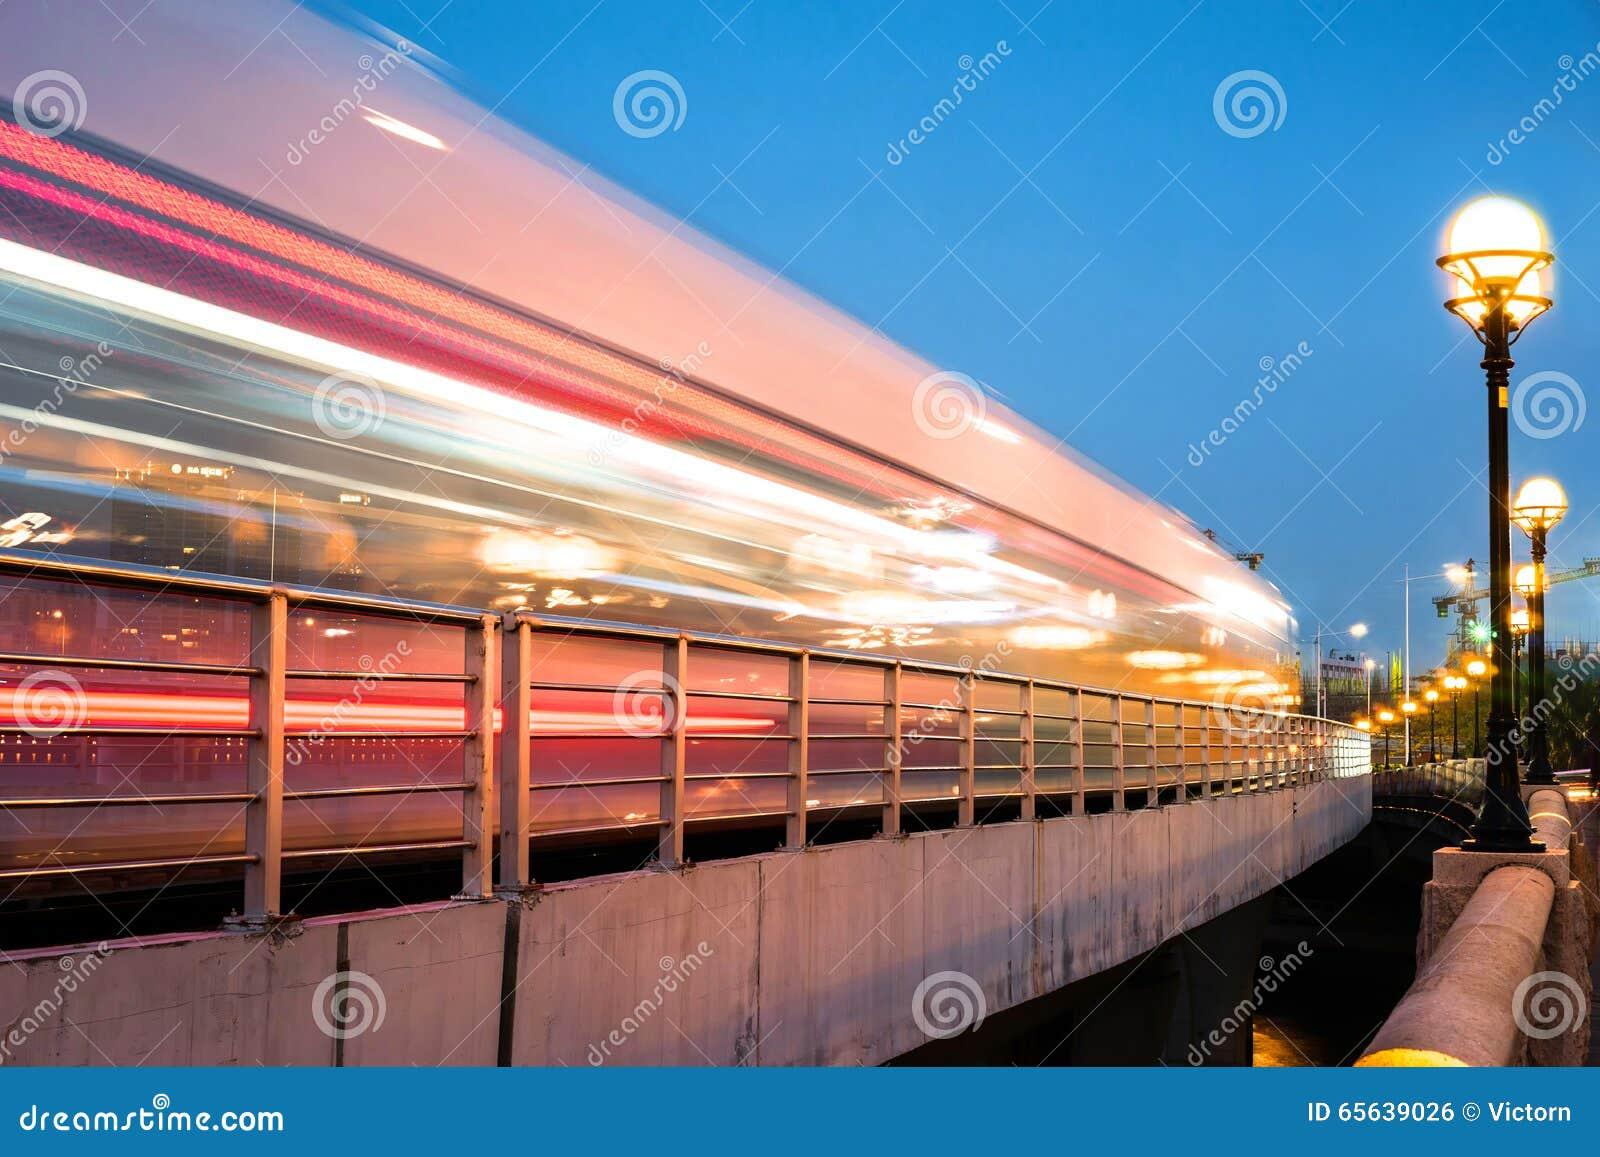 Voiture mobile de tram